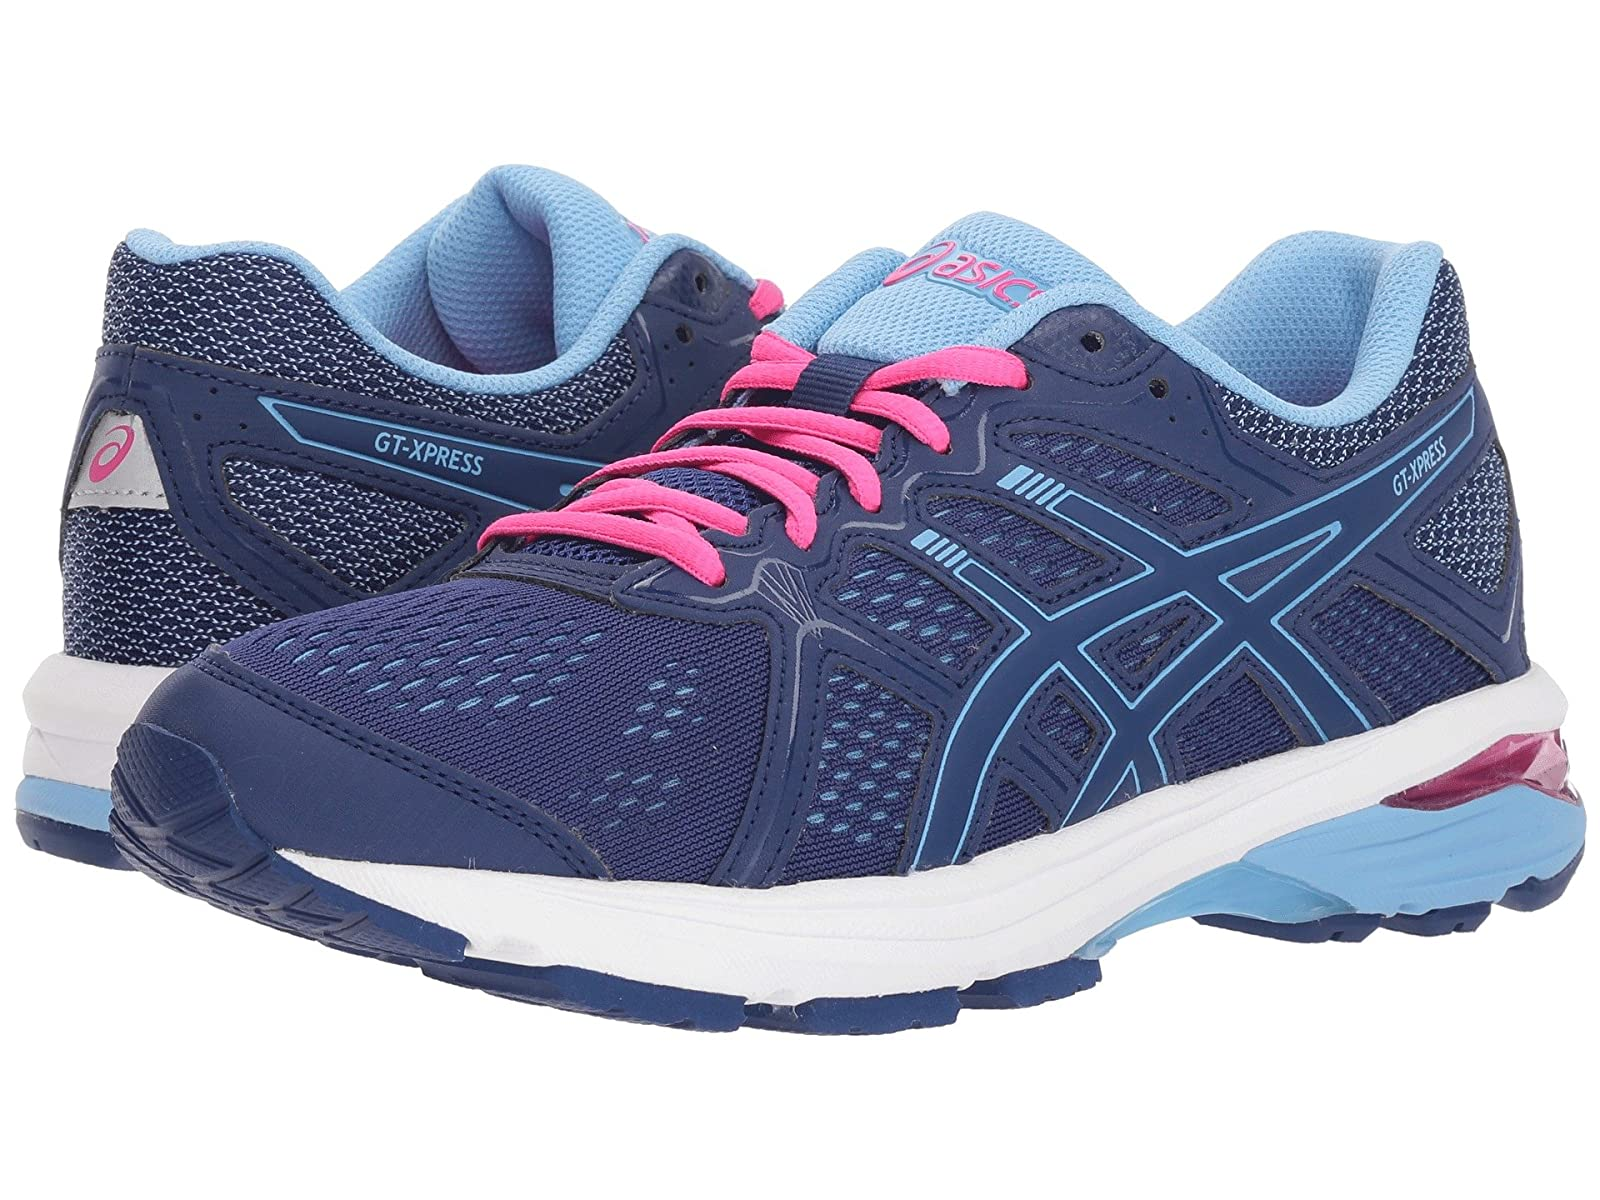 ASICS GT-XpressAtmospheric grades have affordable shoes